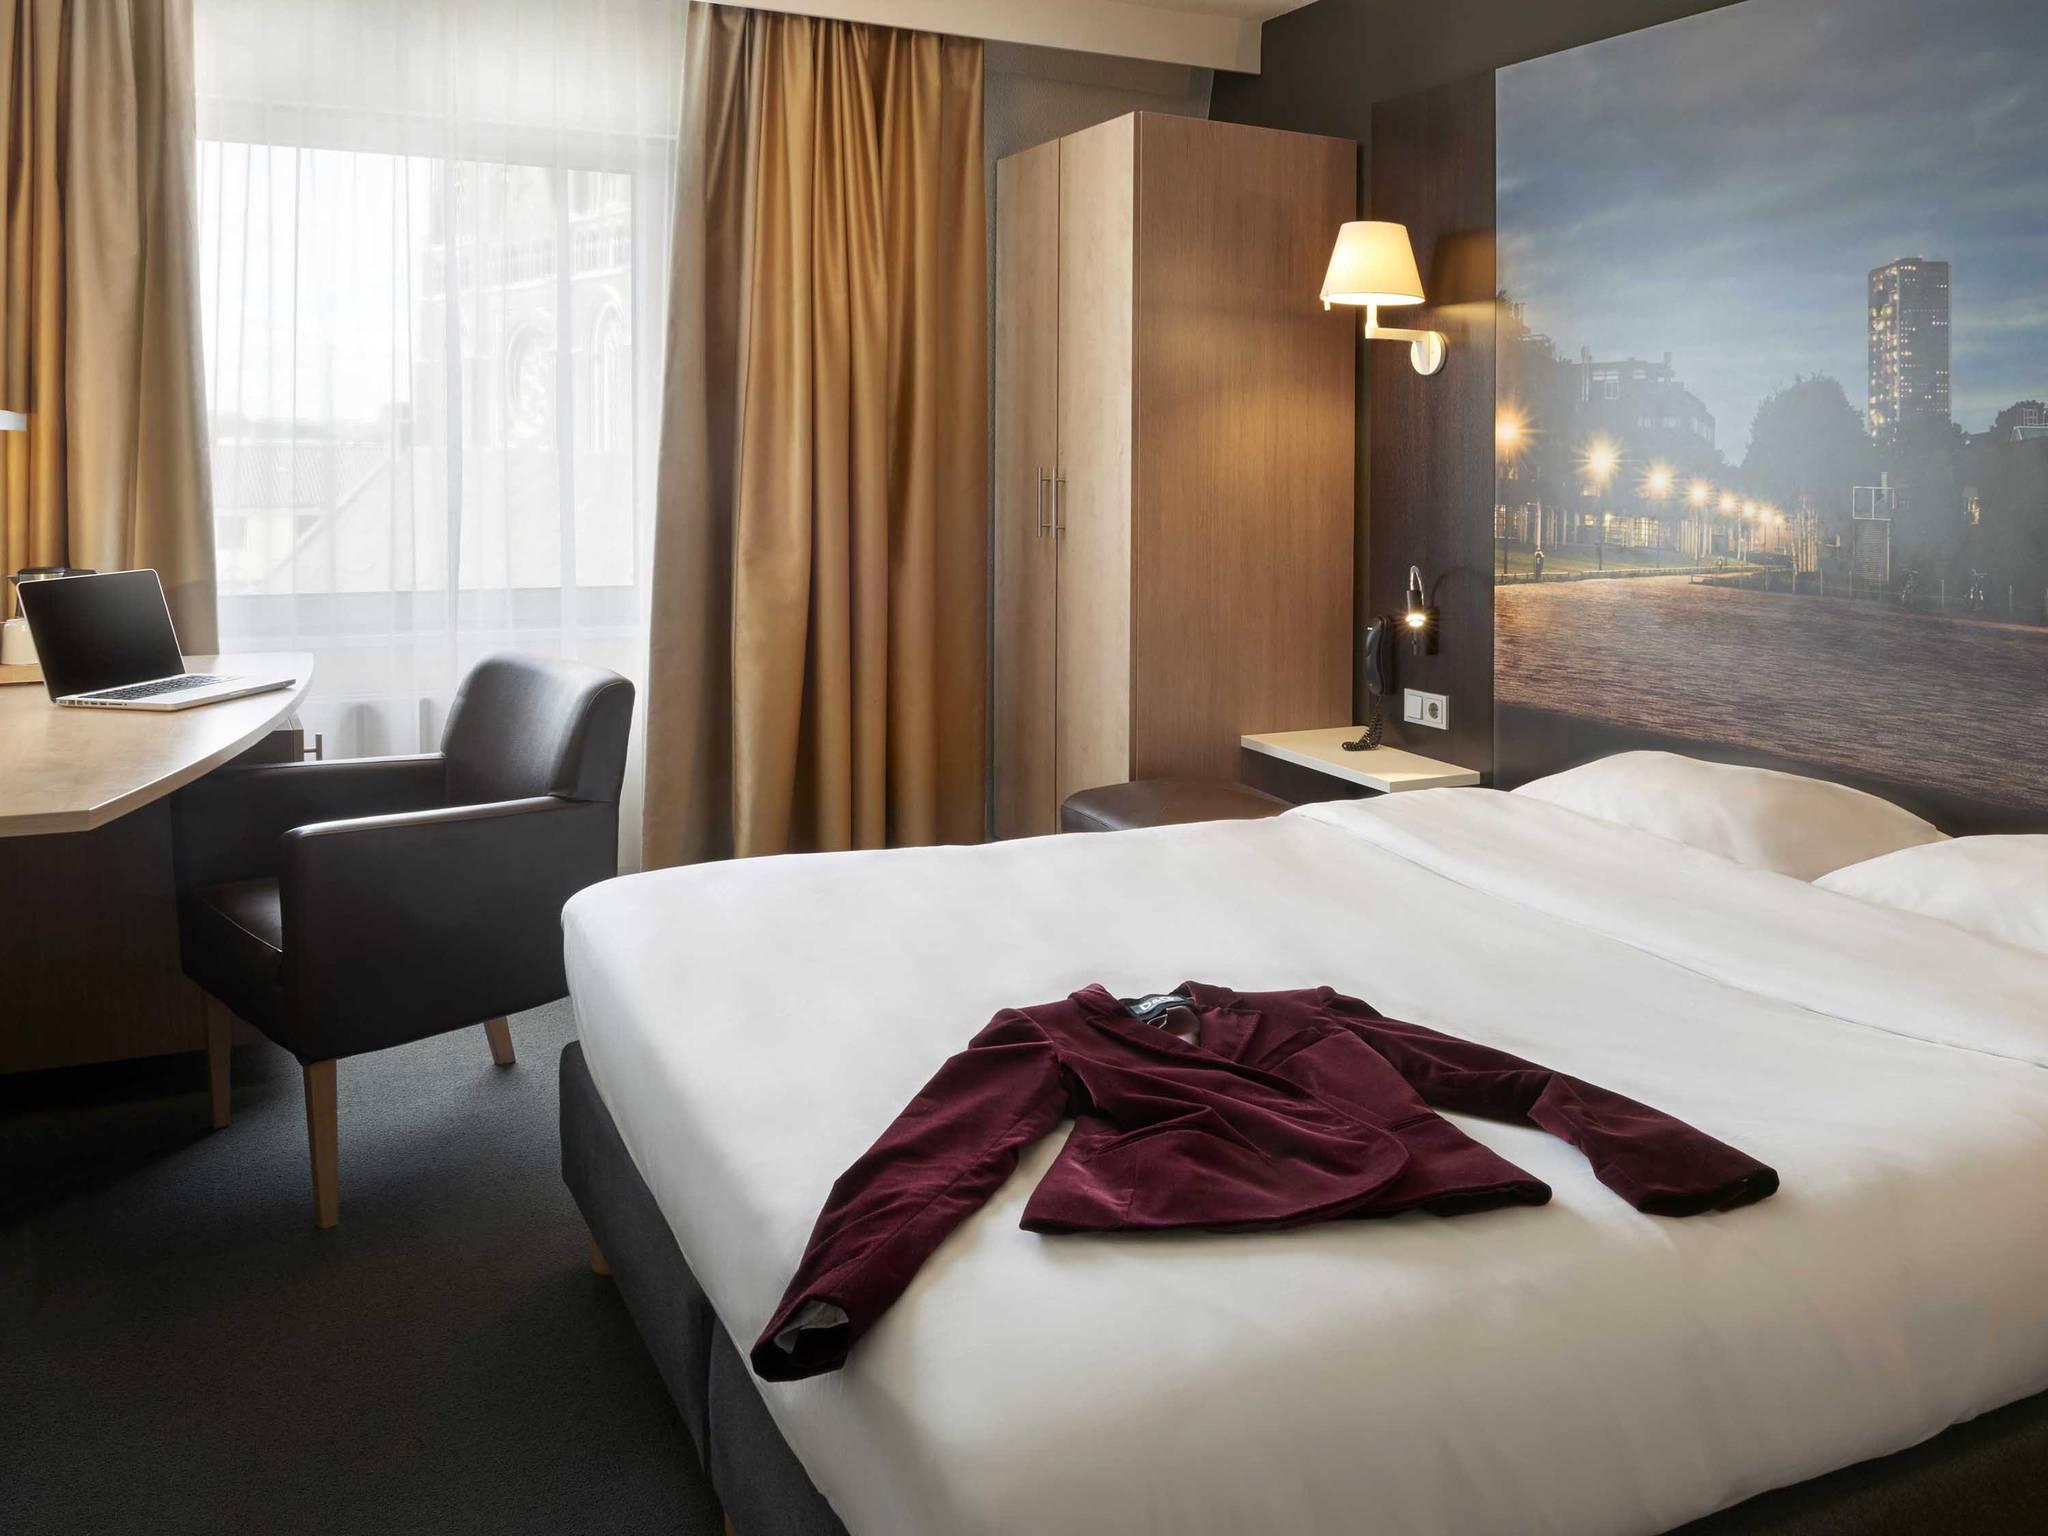 Hotel - Mercure Hotel Tilburg Centrum